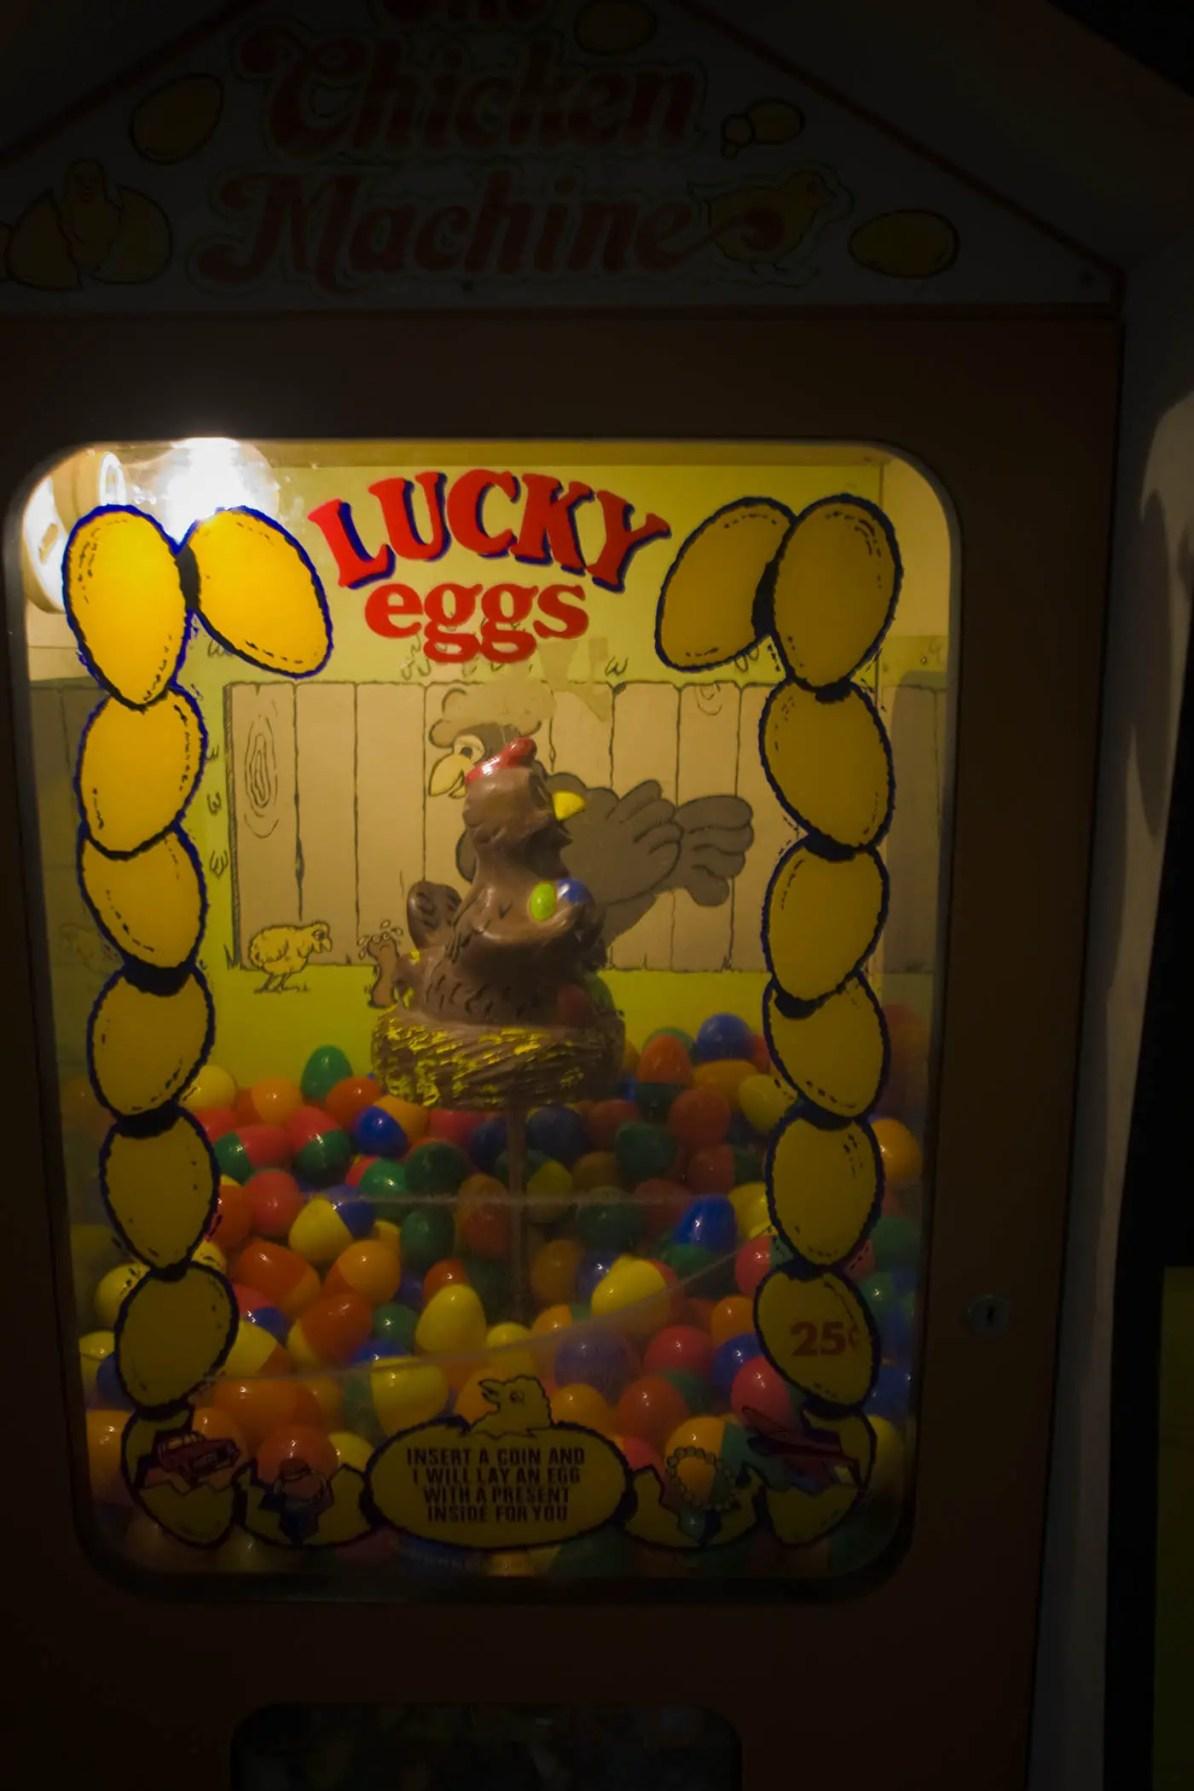 Egg Machine at Wall Drug Store in Wall, South Dakota